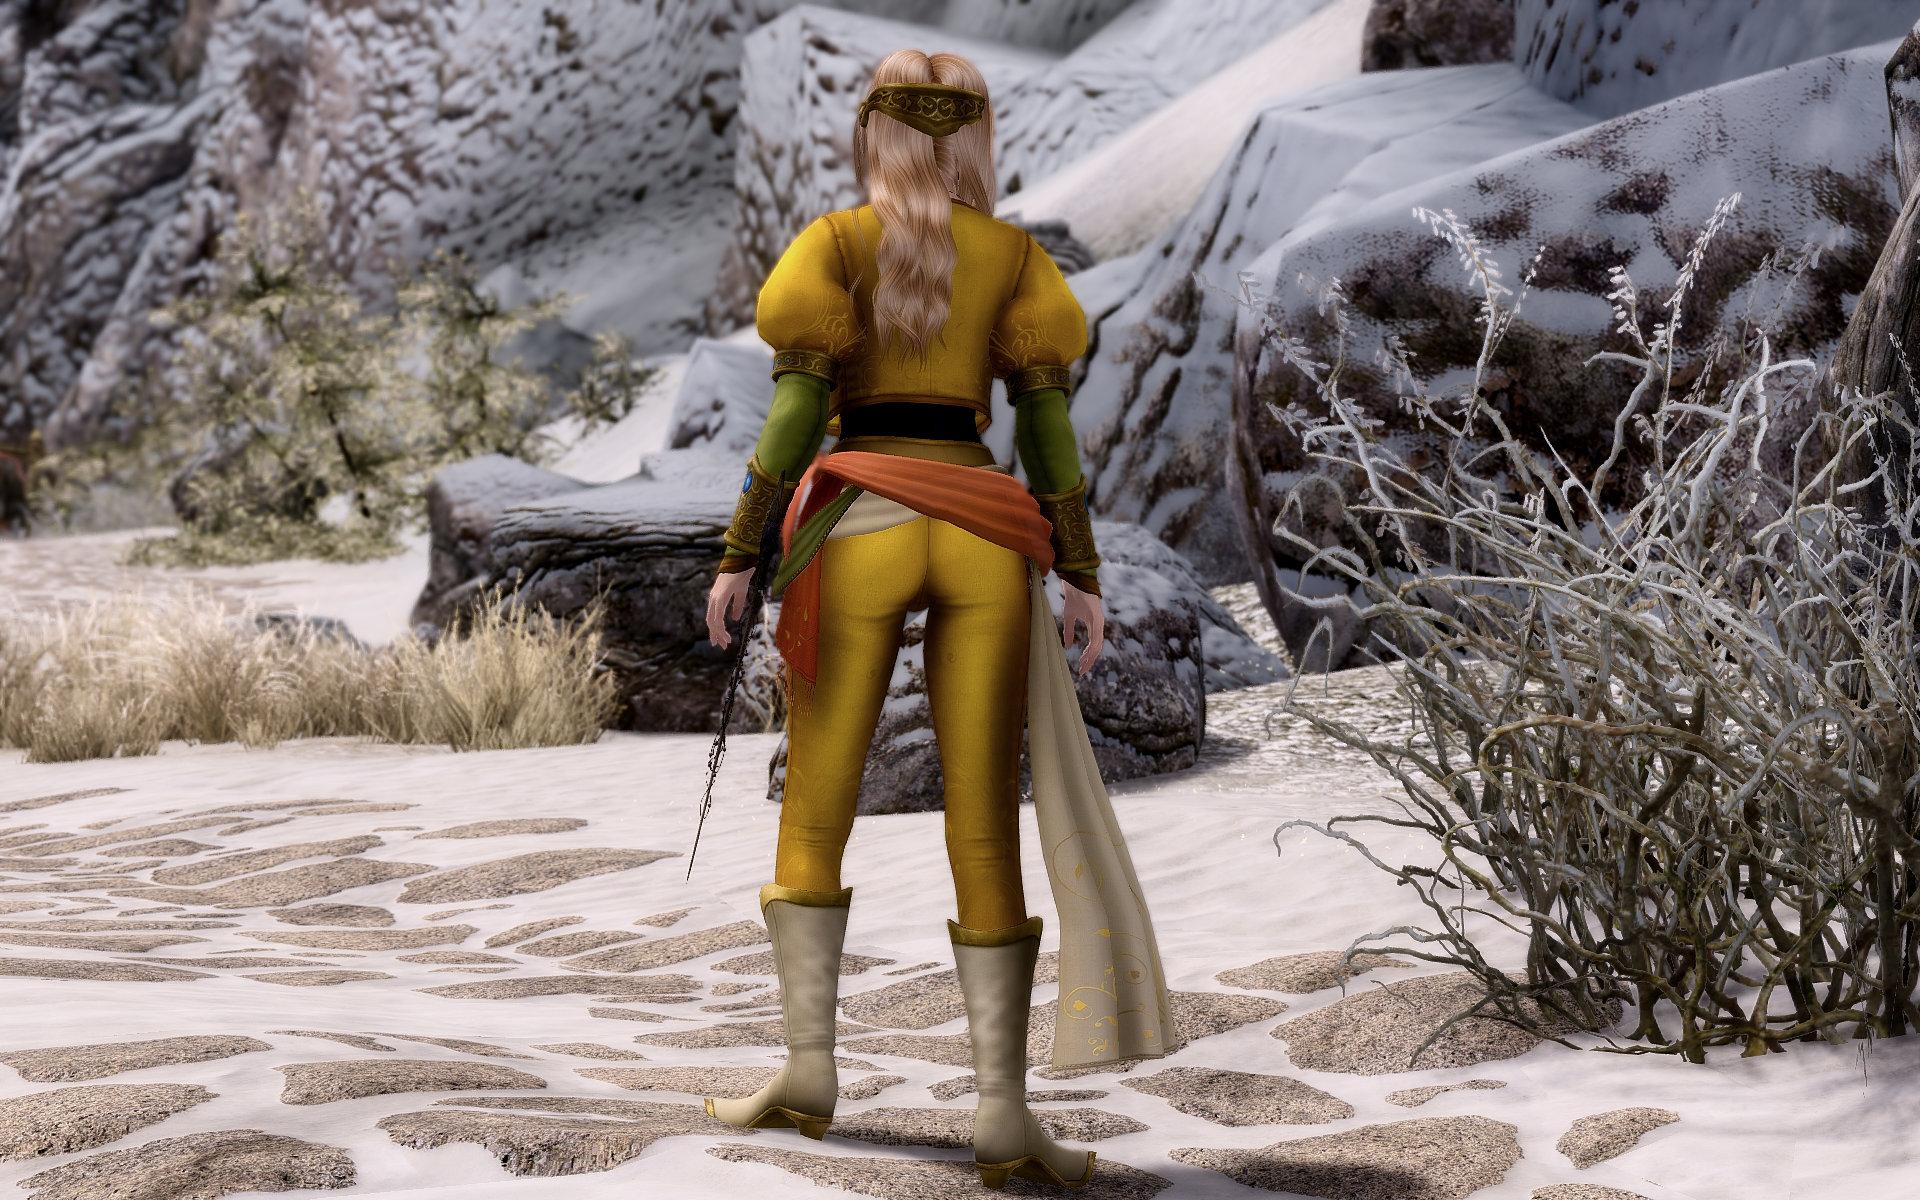 Final Fantasy Ⅵ Celes Outfits & Sword Renewal